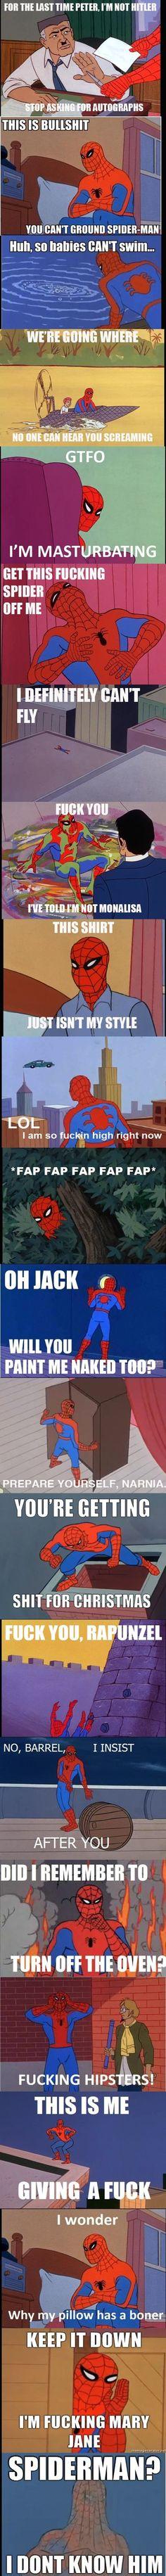 It's Spiderman again!